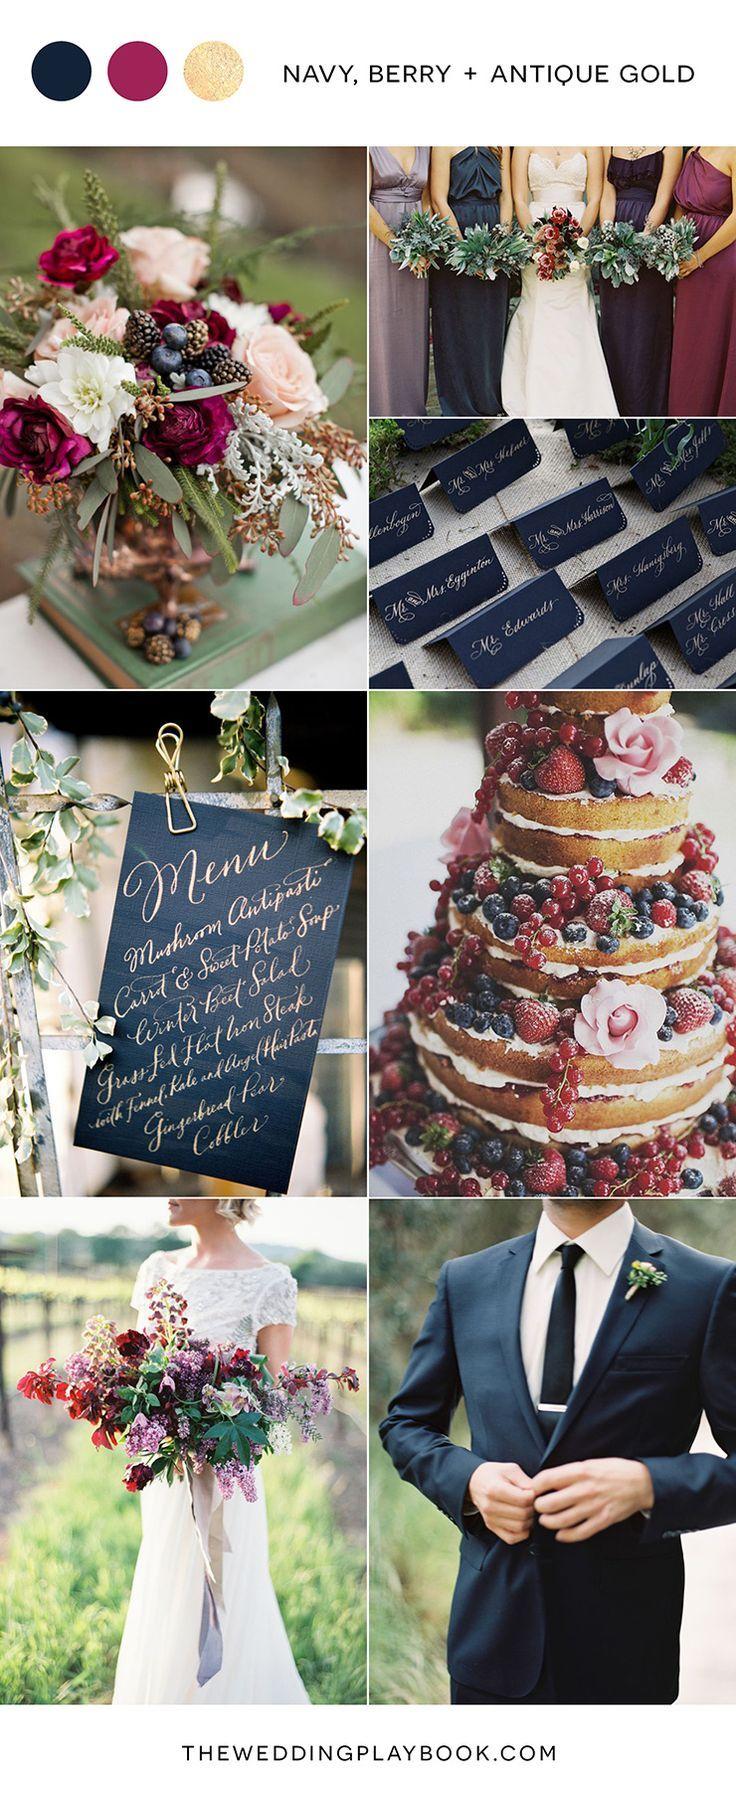 A Blogger's Dream Wedding via @weddingplaybook